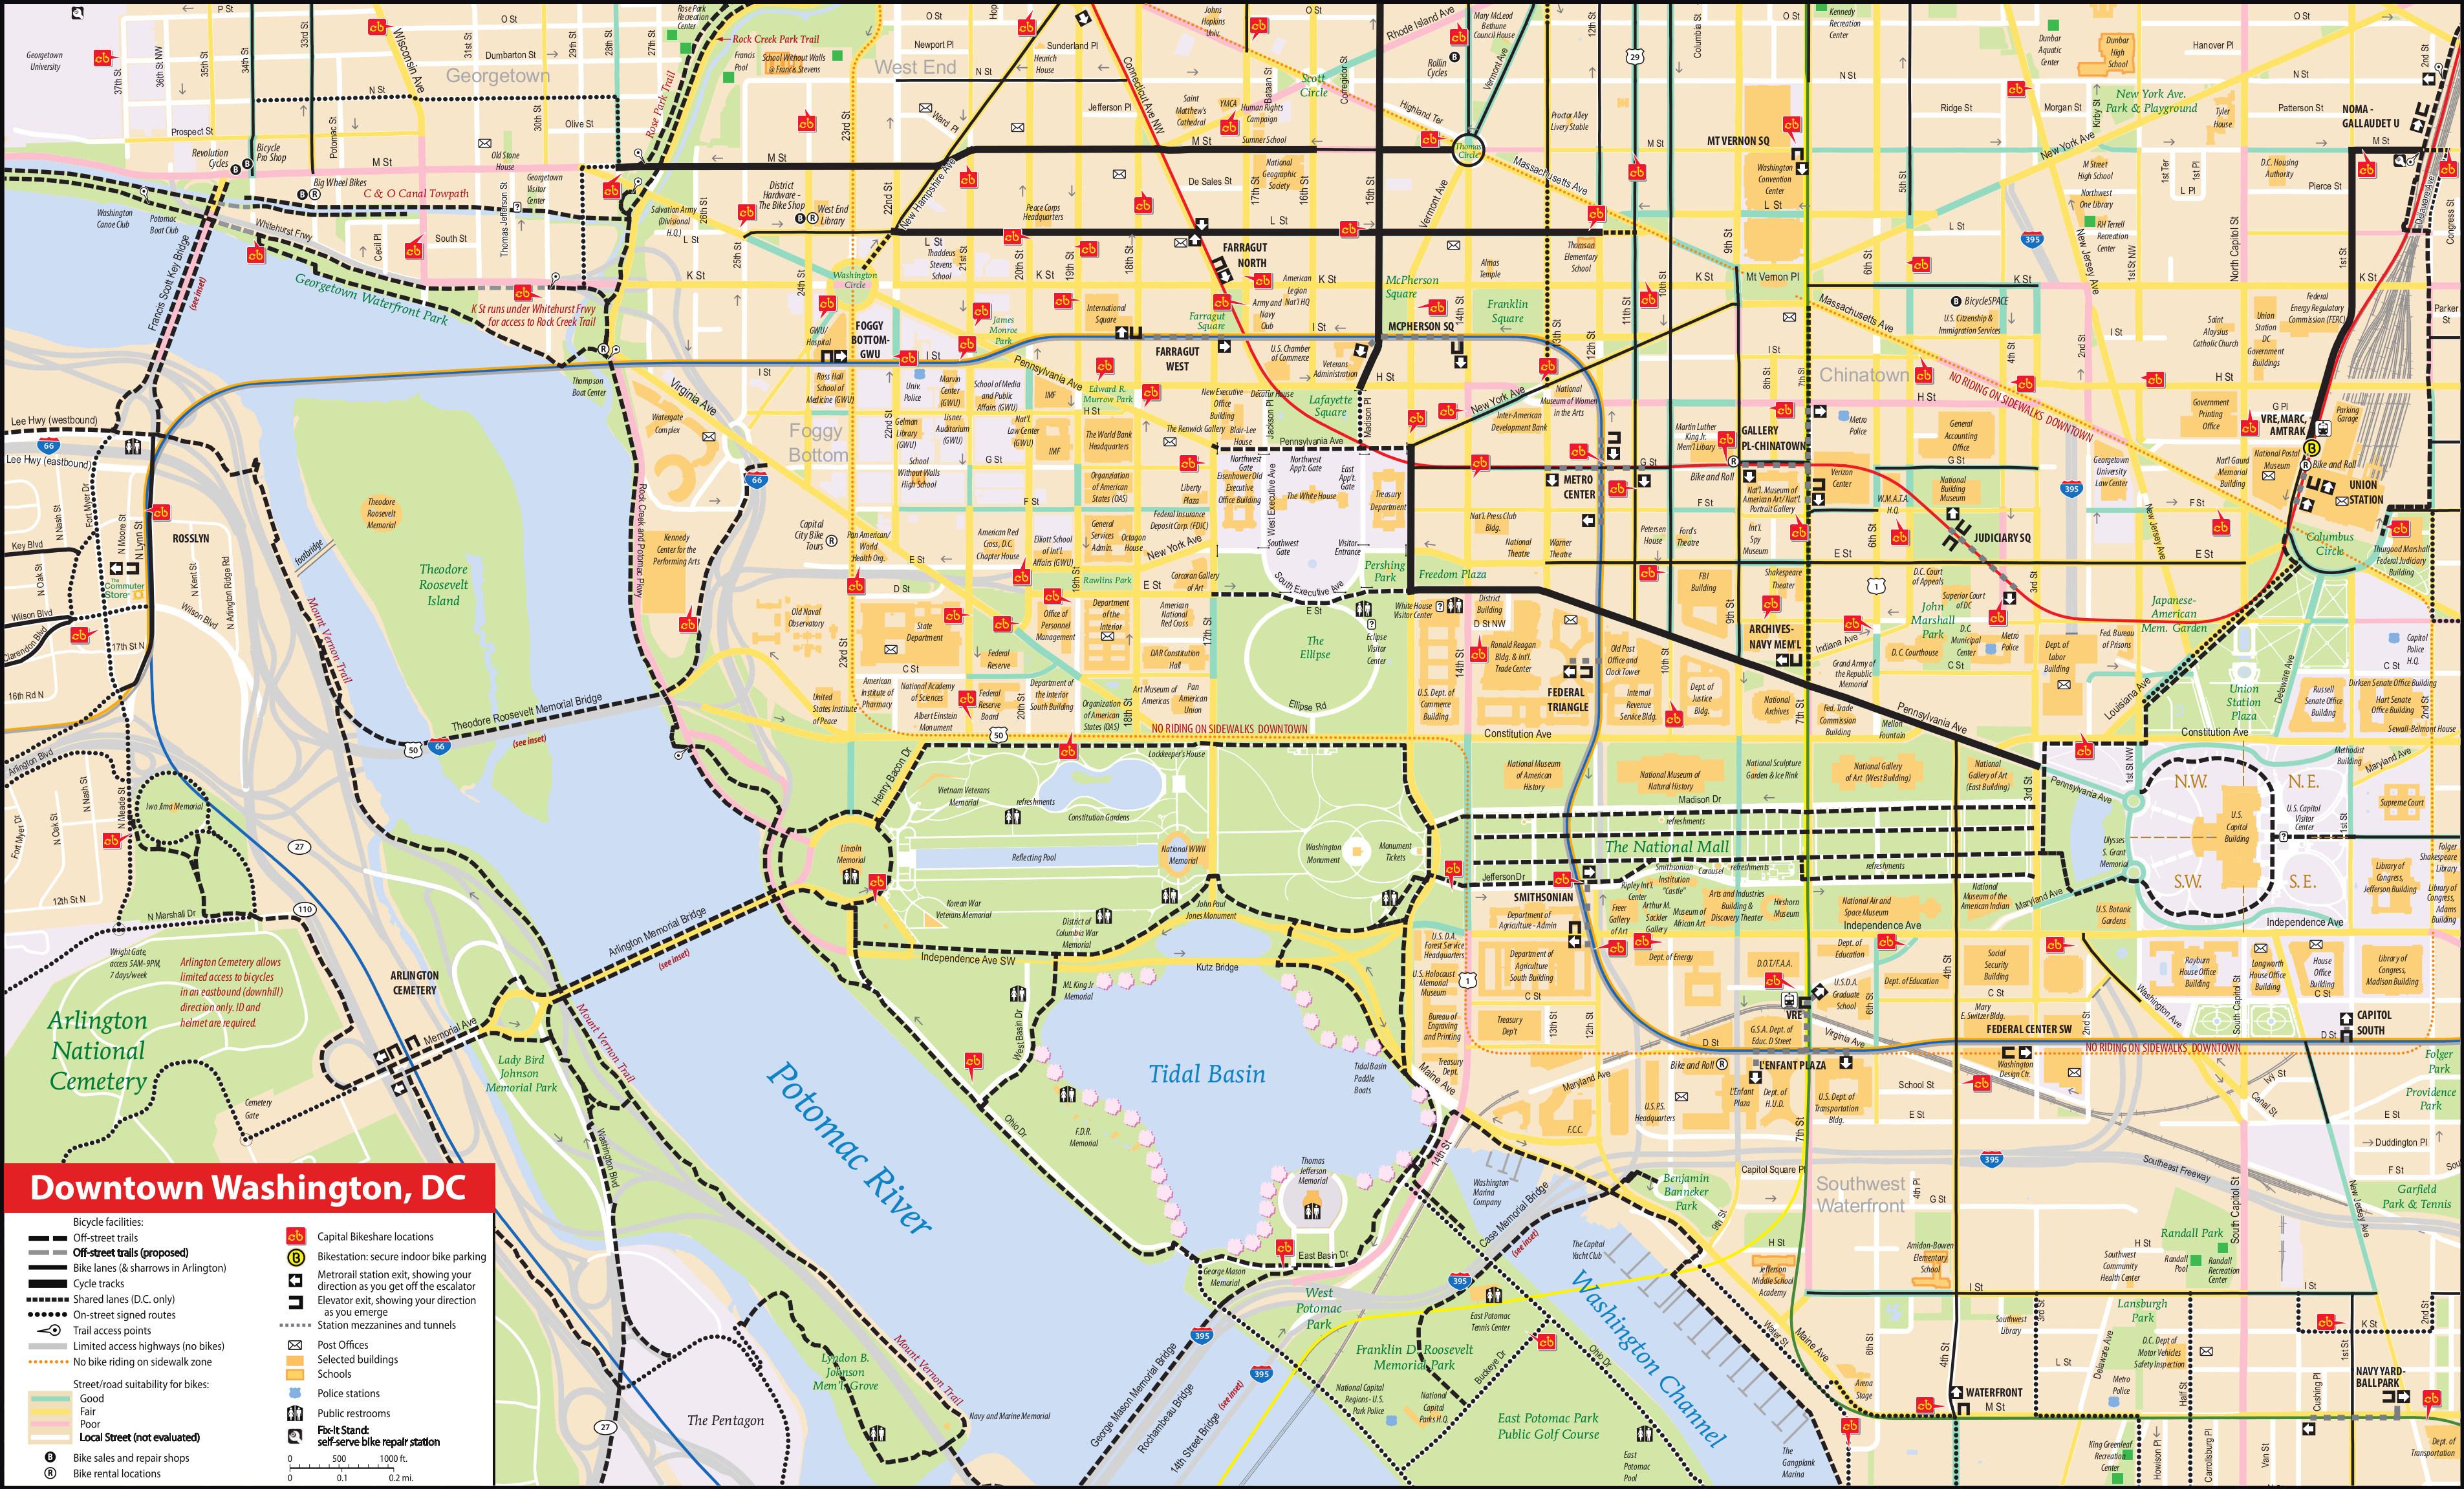 National Mall Maps | Npmaps - Just Free Maps, Period. - Printable Map Of Washington Dc